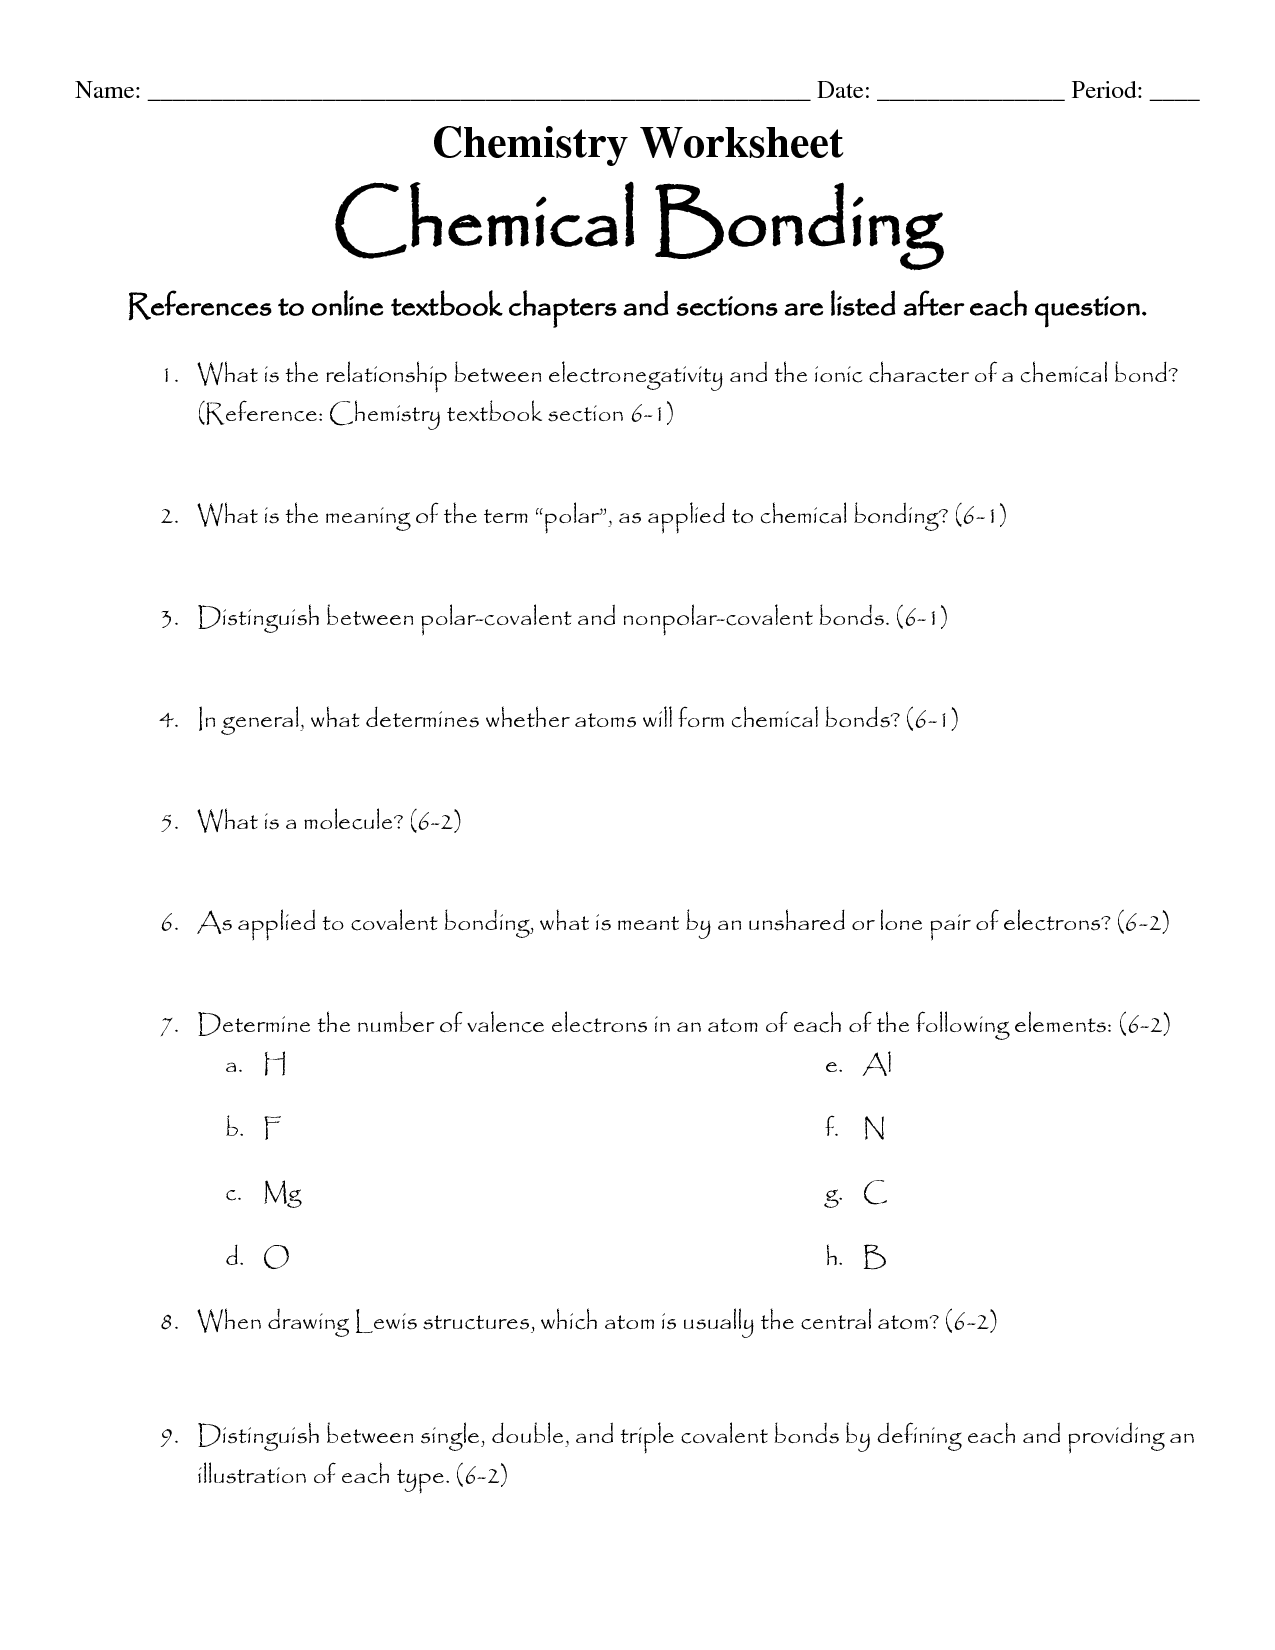 15 Best Images Of Holt Chemical Bonding Worksheet Answer